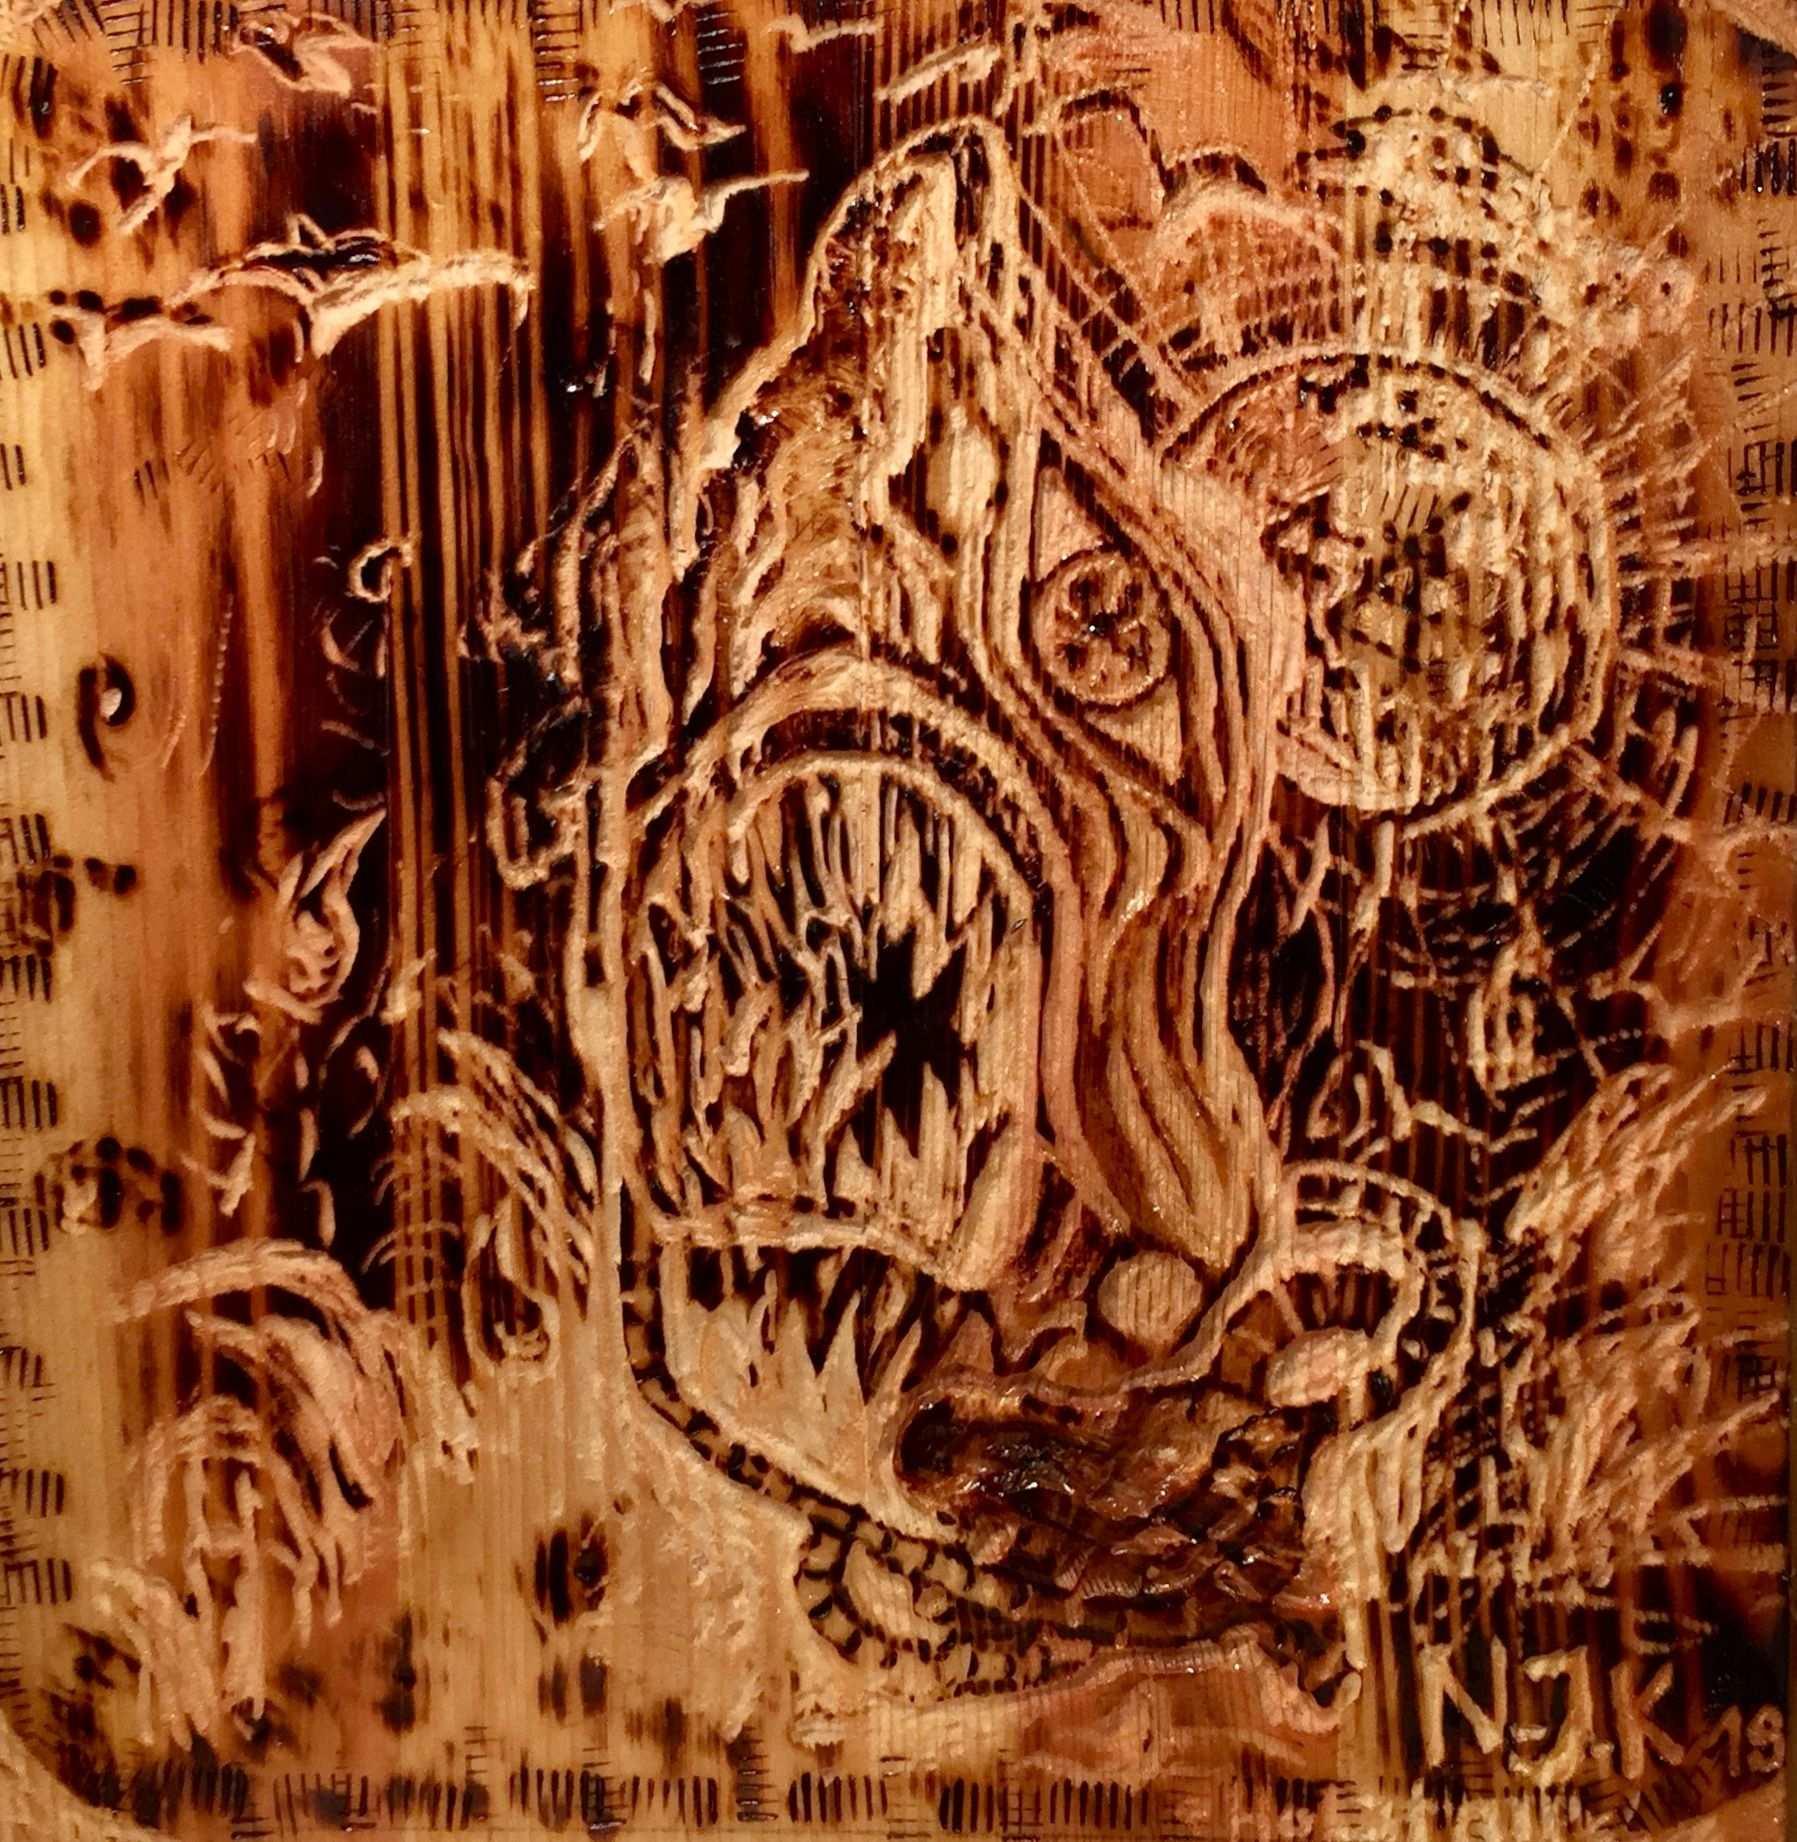 Hai Meer Flut Sonne Holzteufel By N J K Bild Holz 3d Brandmalerei 3d Zeichnen Malerei Bild Auf Holz